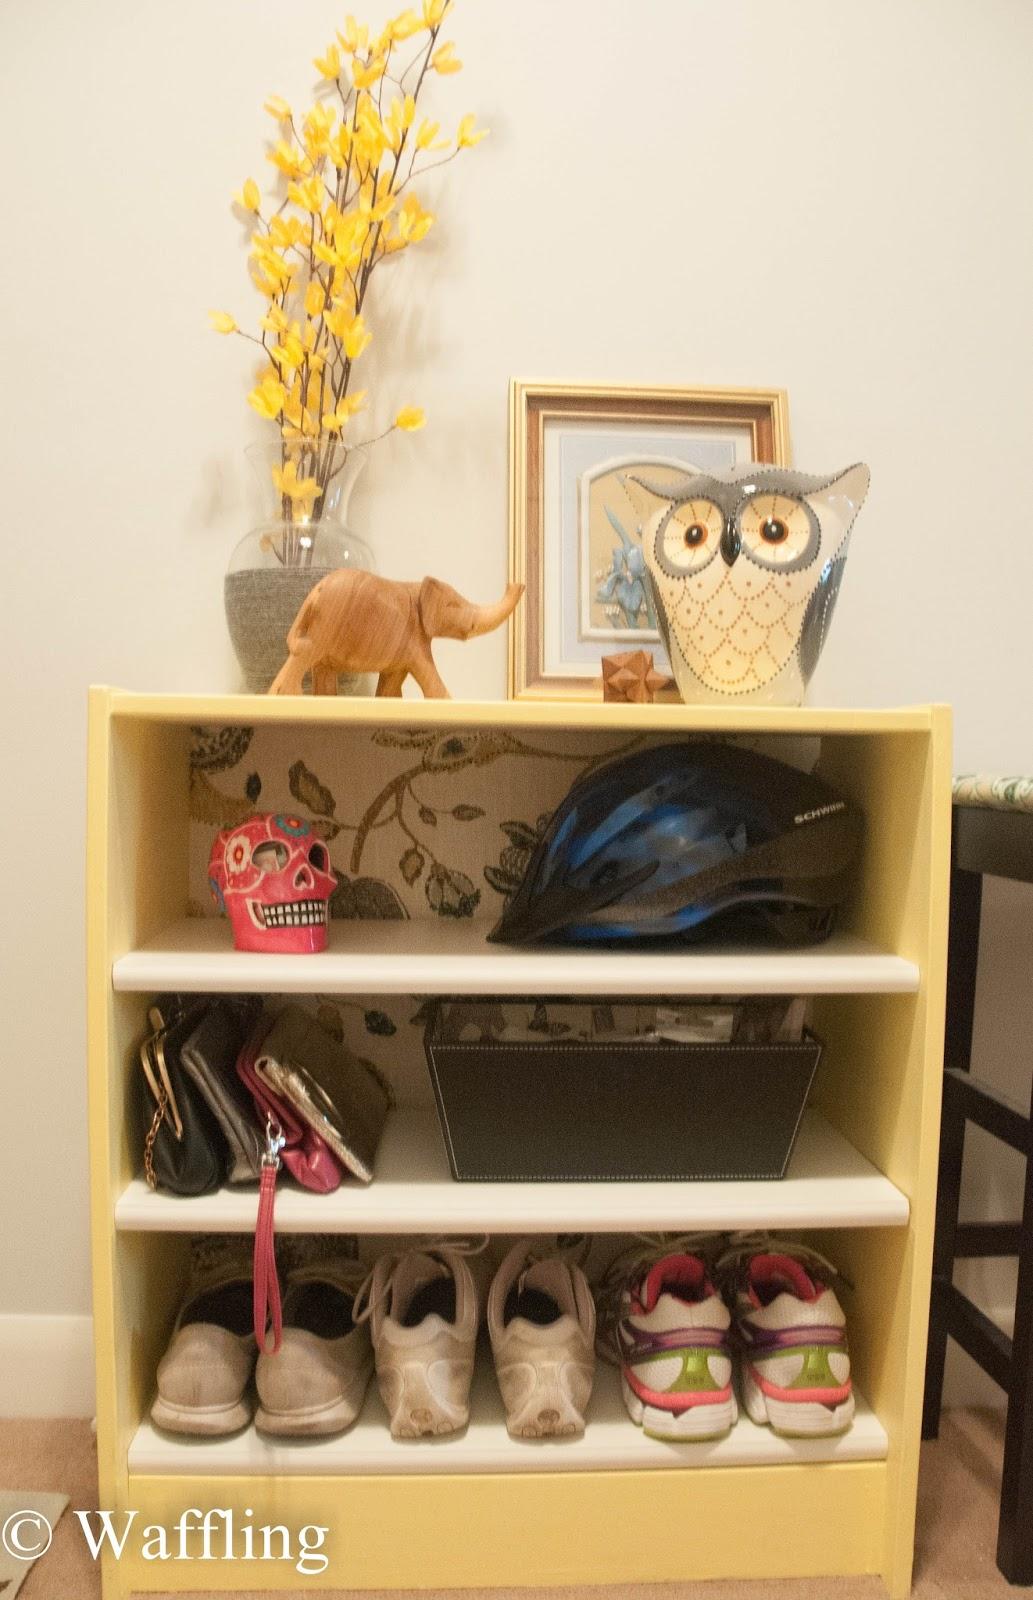 furniture repurposing with diy my bookshelf organizing shelving hometalk painted dresser upcycling